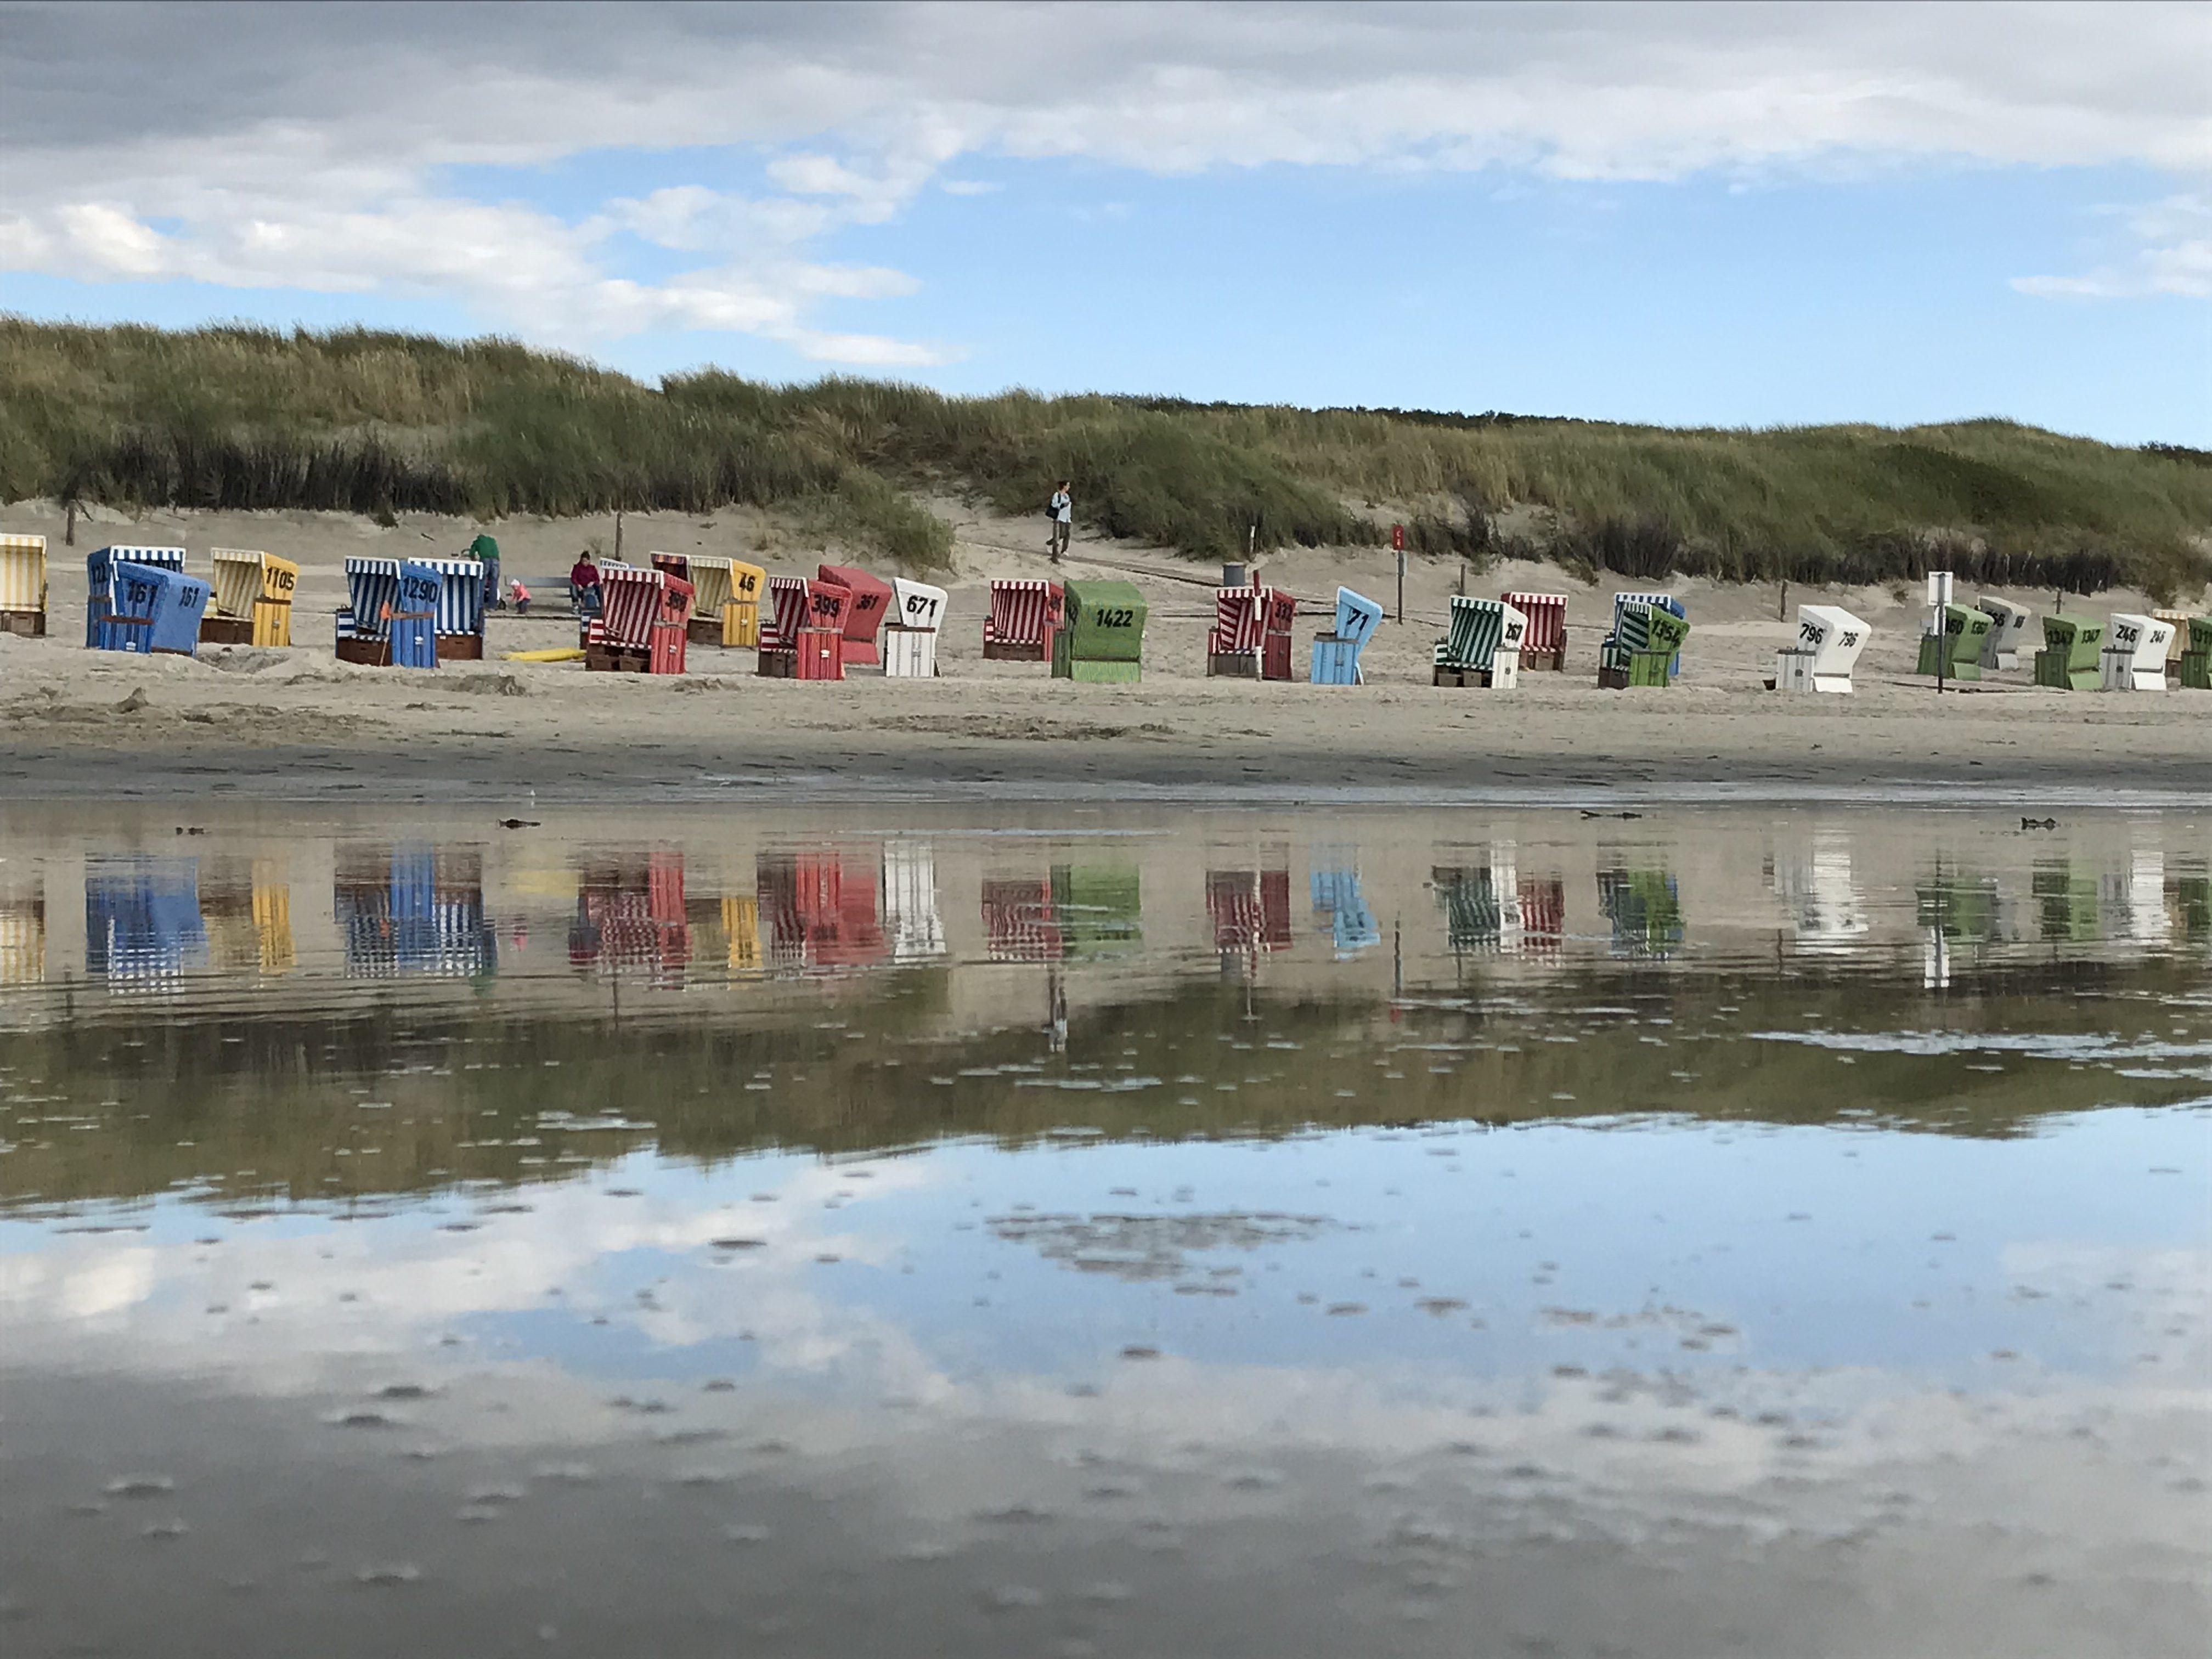 Strandkörbe Langeoog